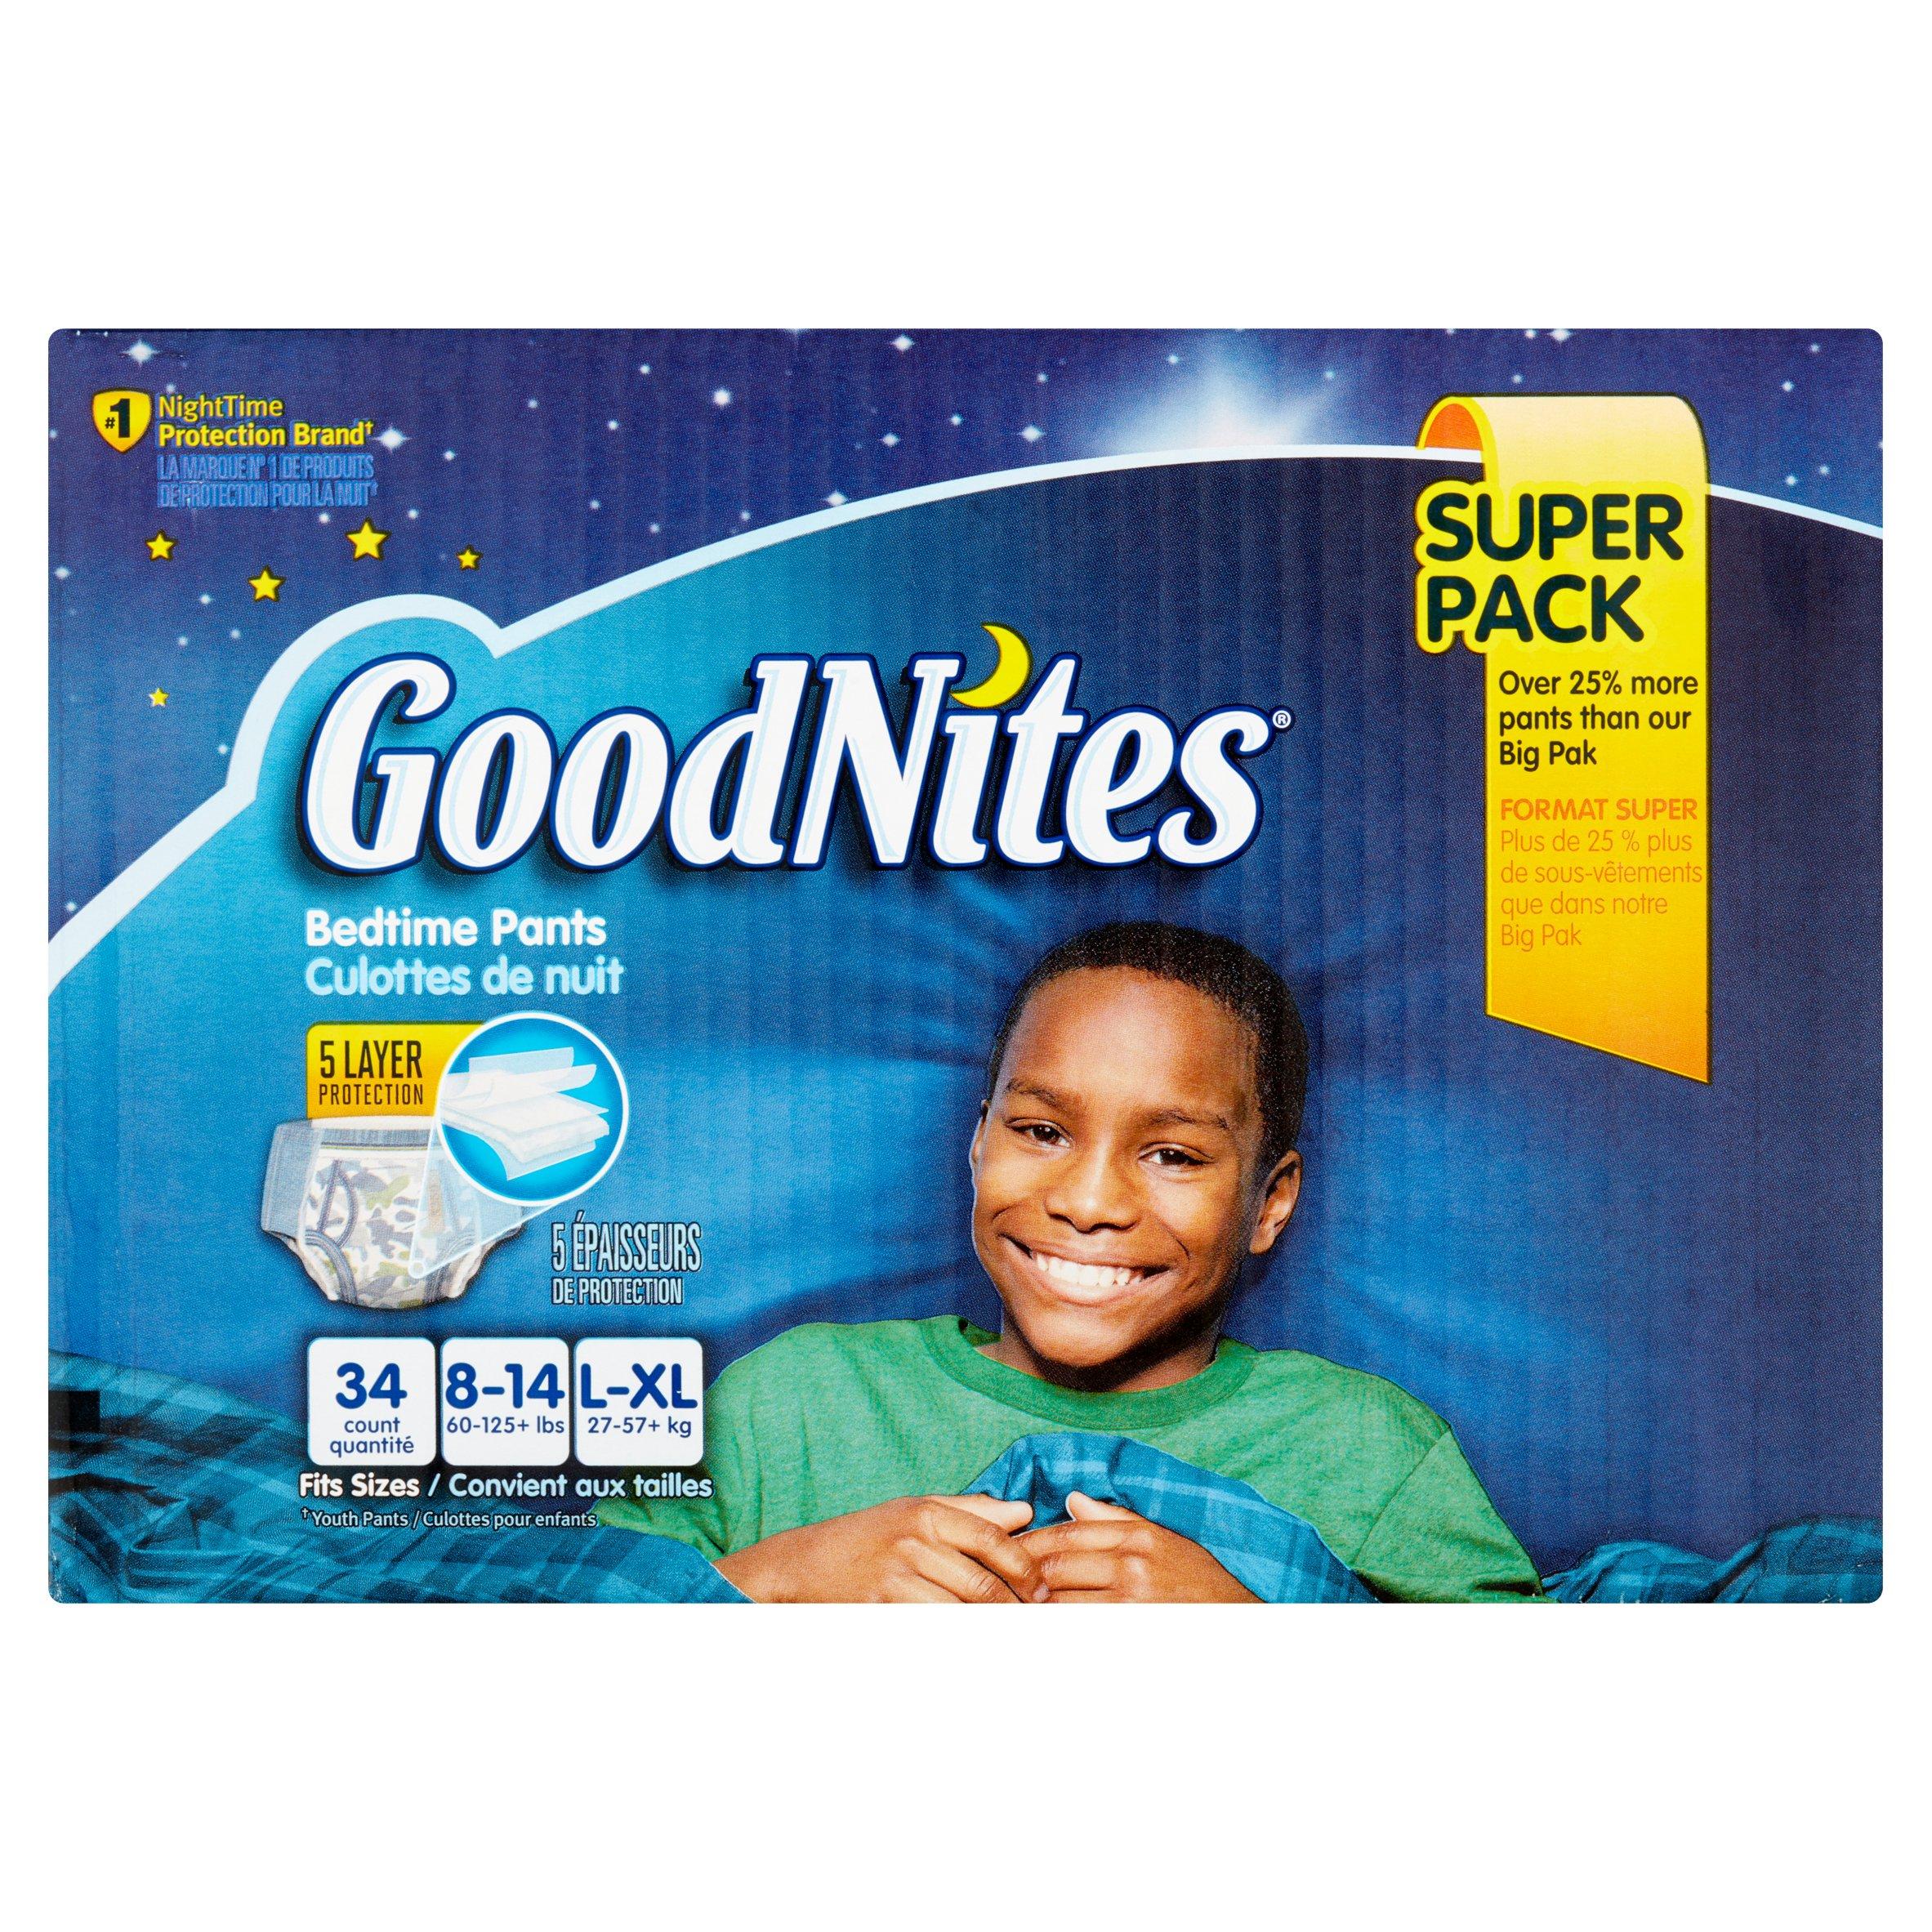 GoodNites Bedtime Pants Super Pack L-XL - 34 CT